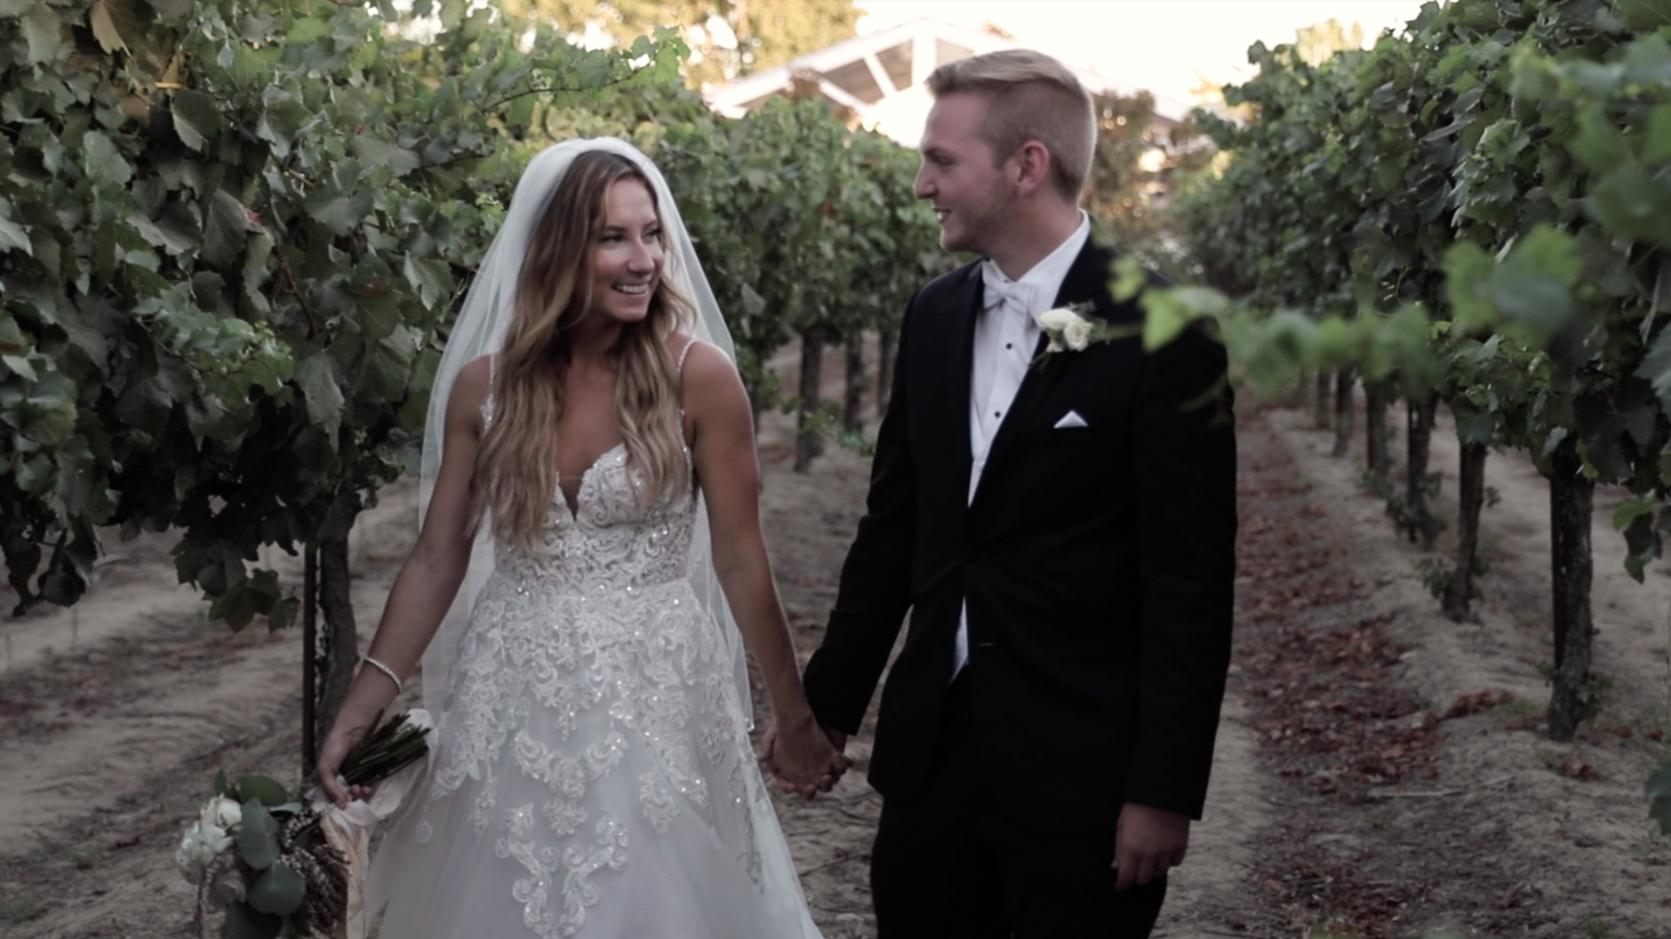 Wedding Photo at Scribner Vineyards